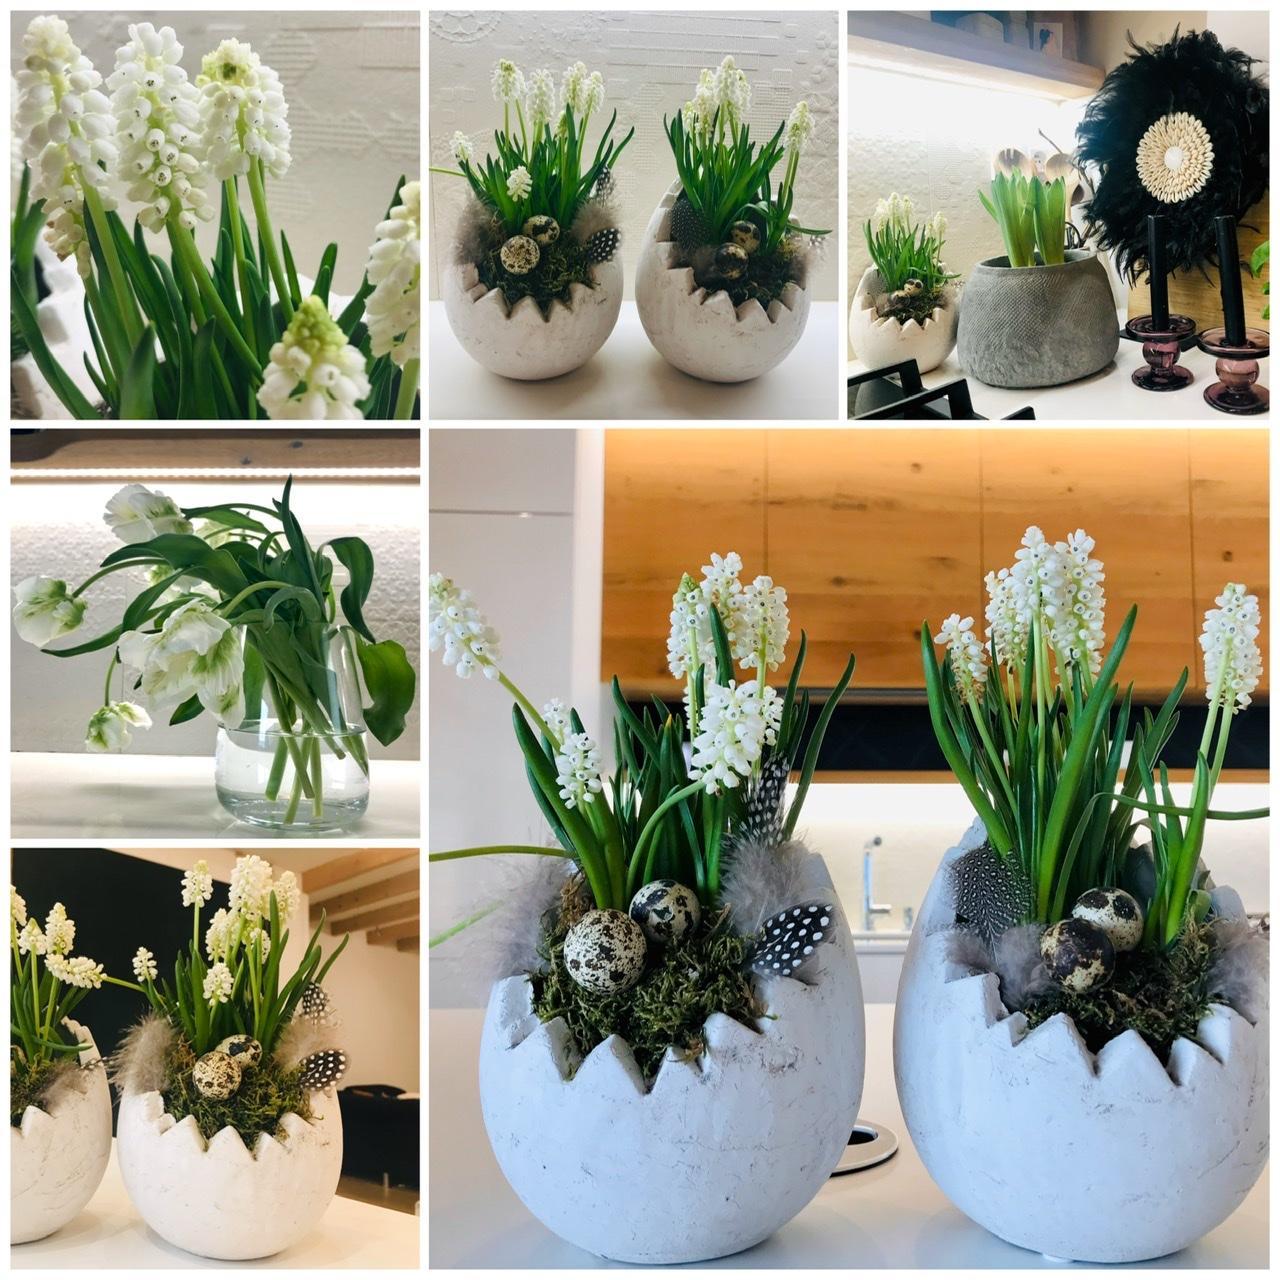 Naše L-ko - 2021 - stále dokončujeme - Obľúbené biele modrice a biele tulipány